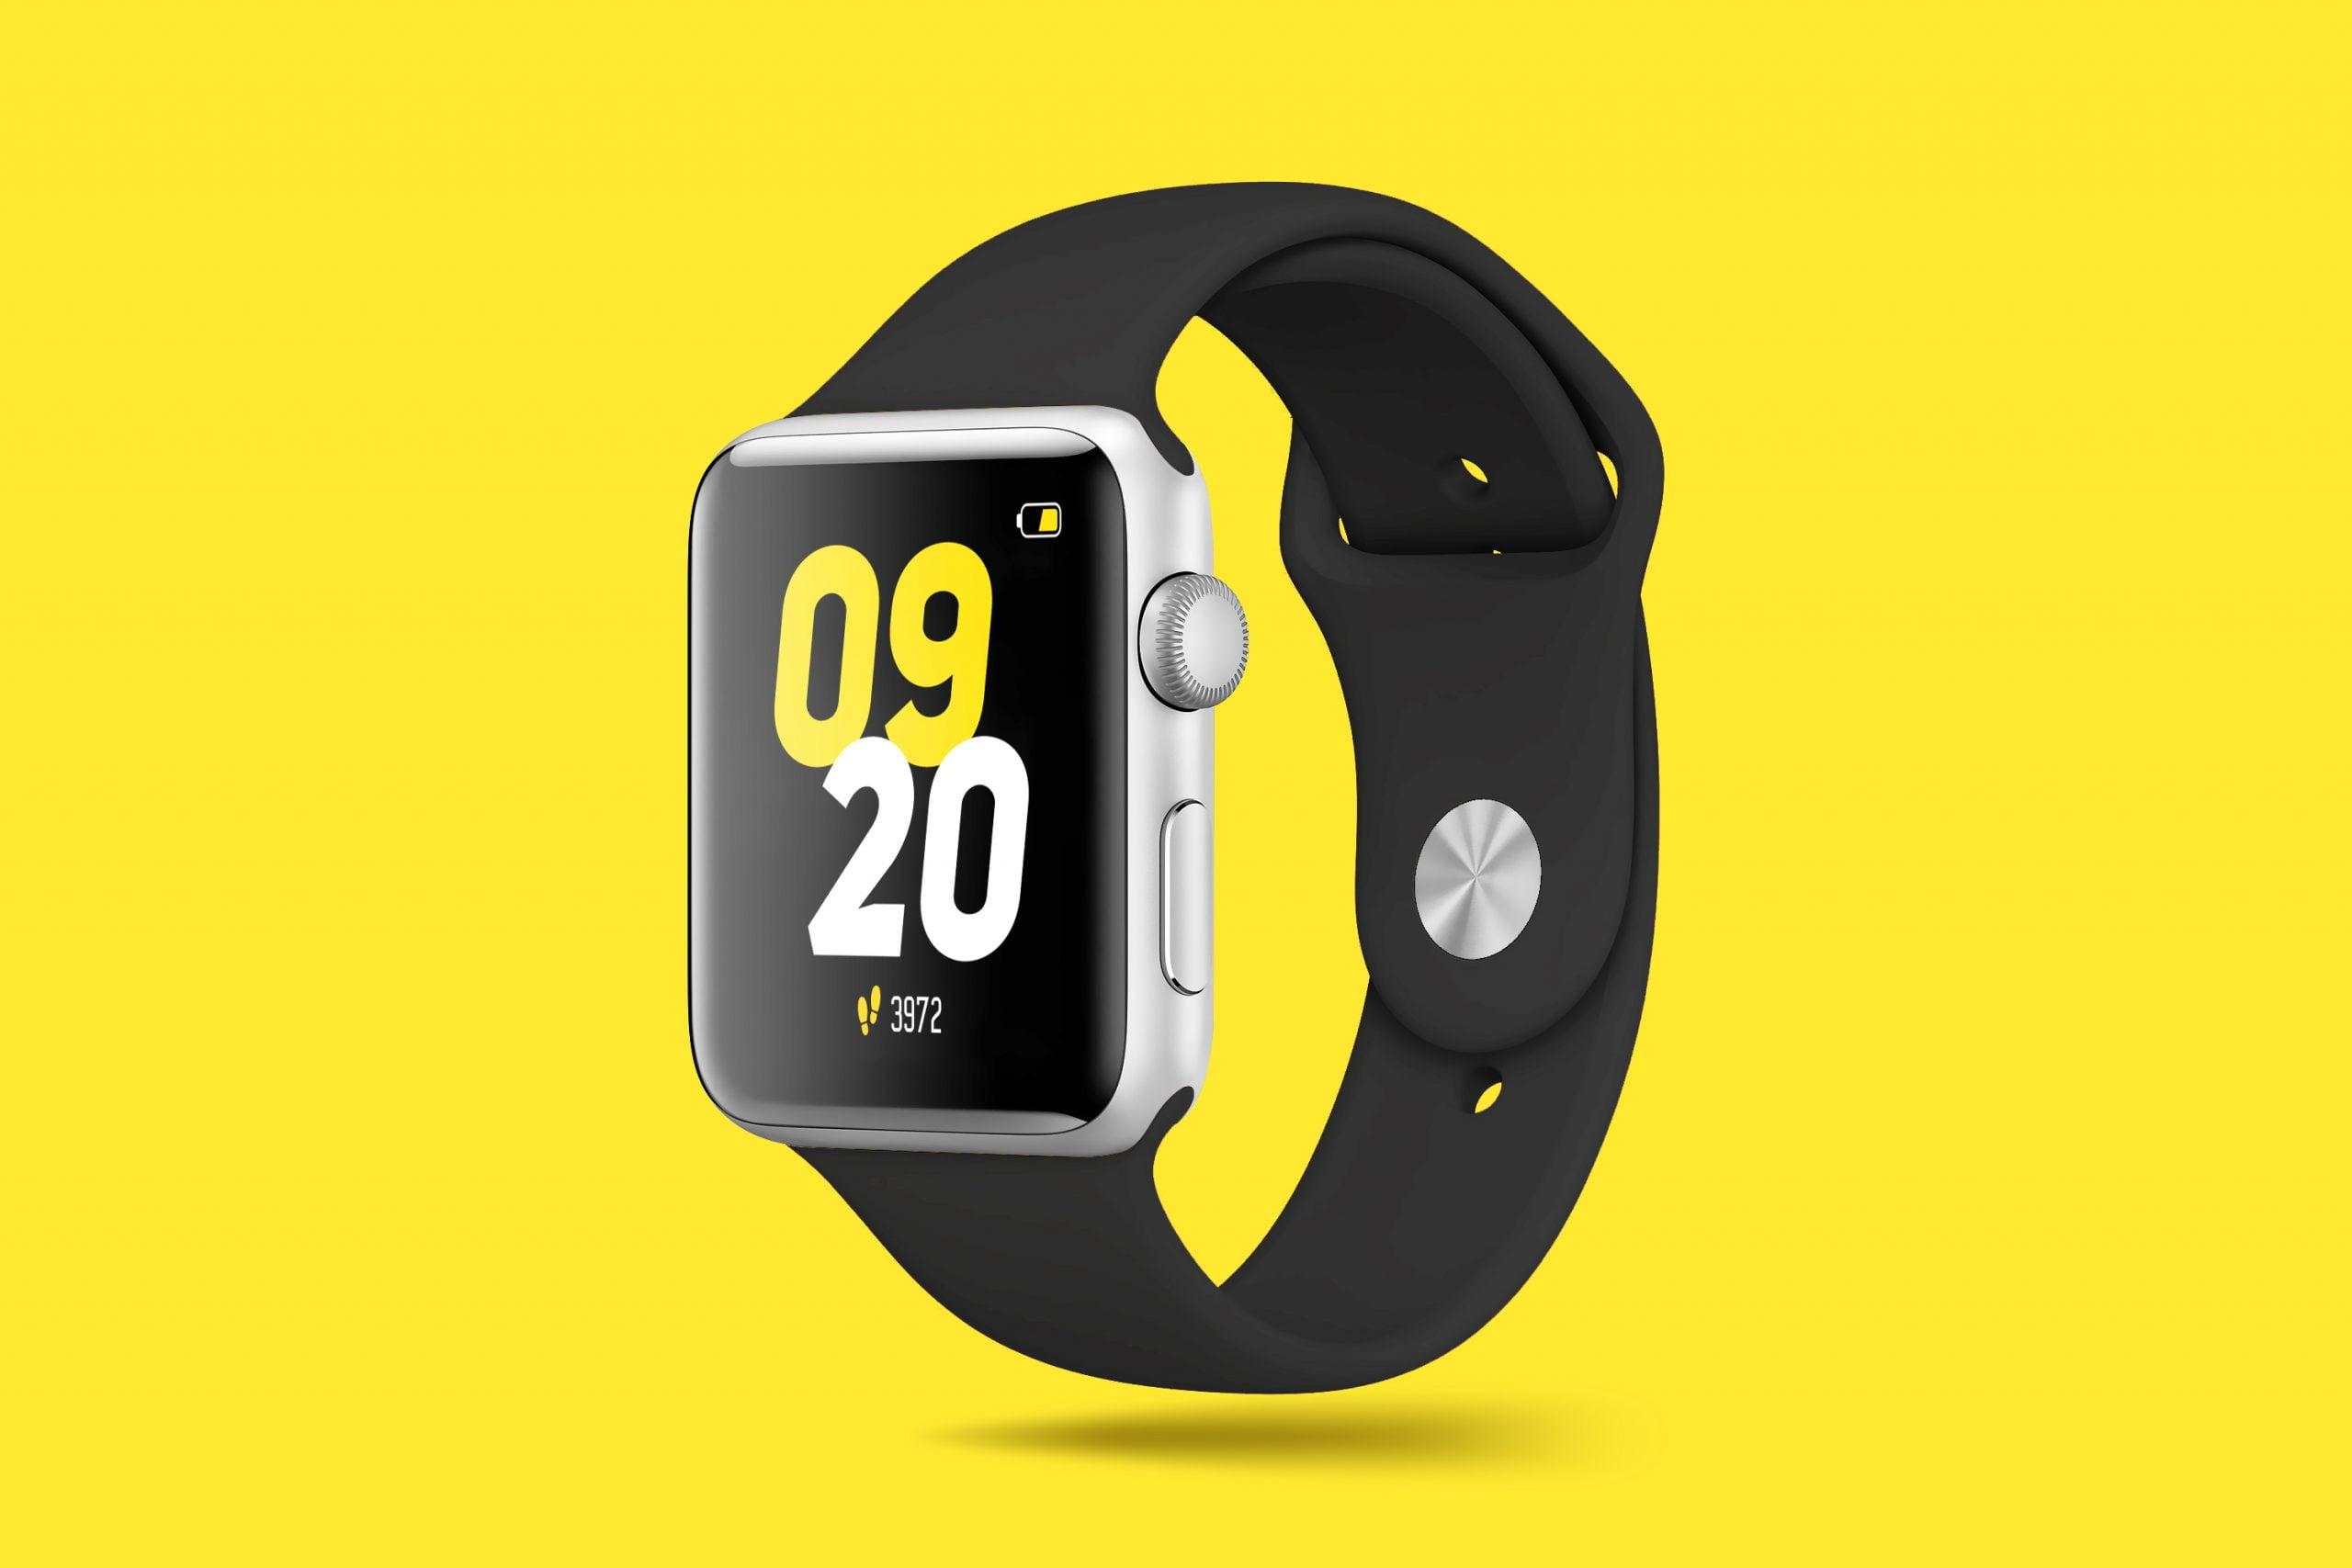 Smart Watch Mockup Design 1